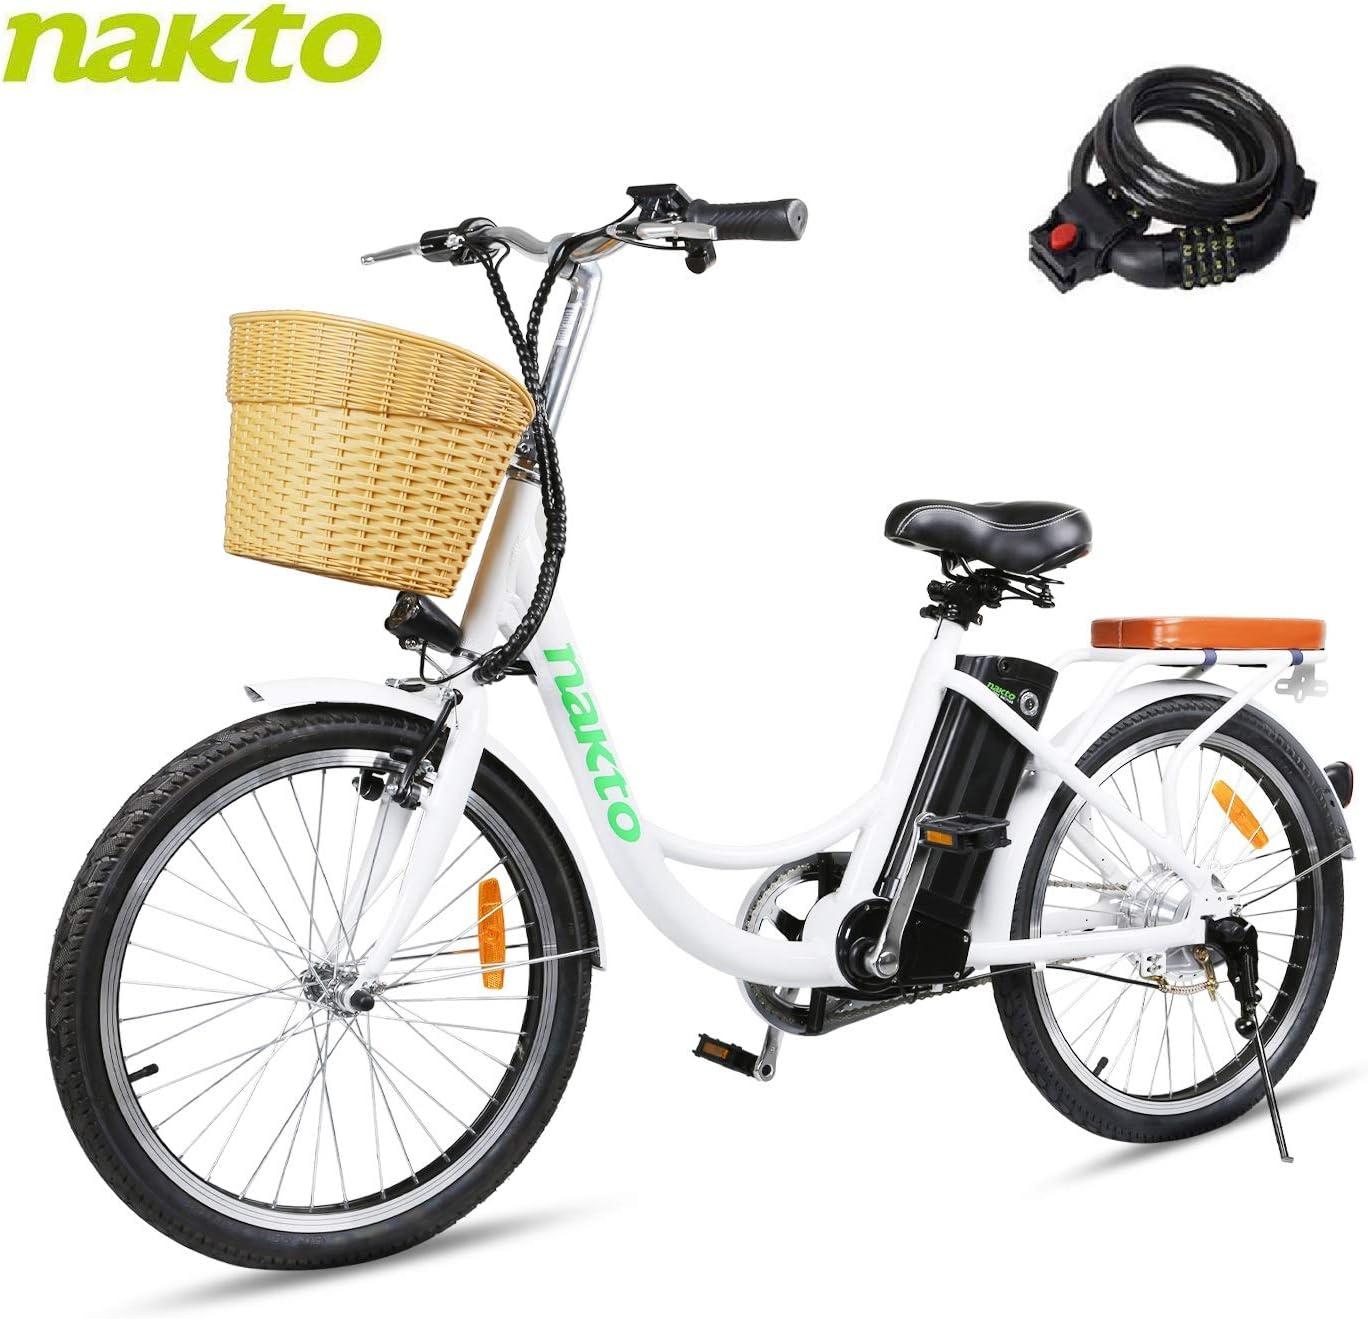 22 inch City Electric Bike